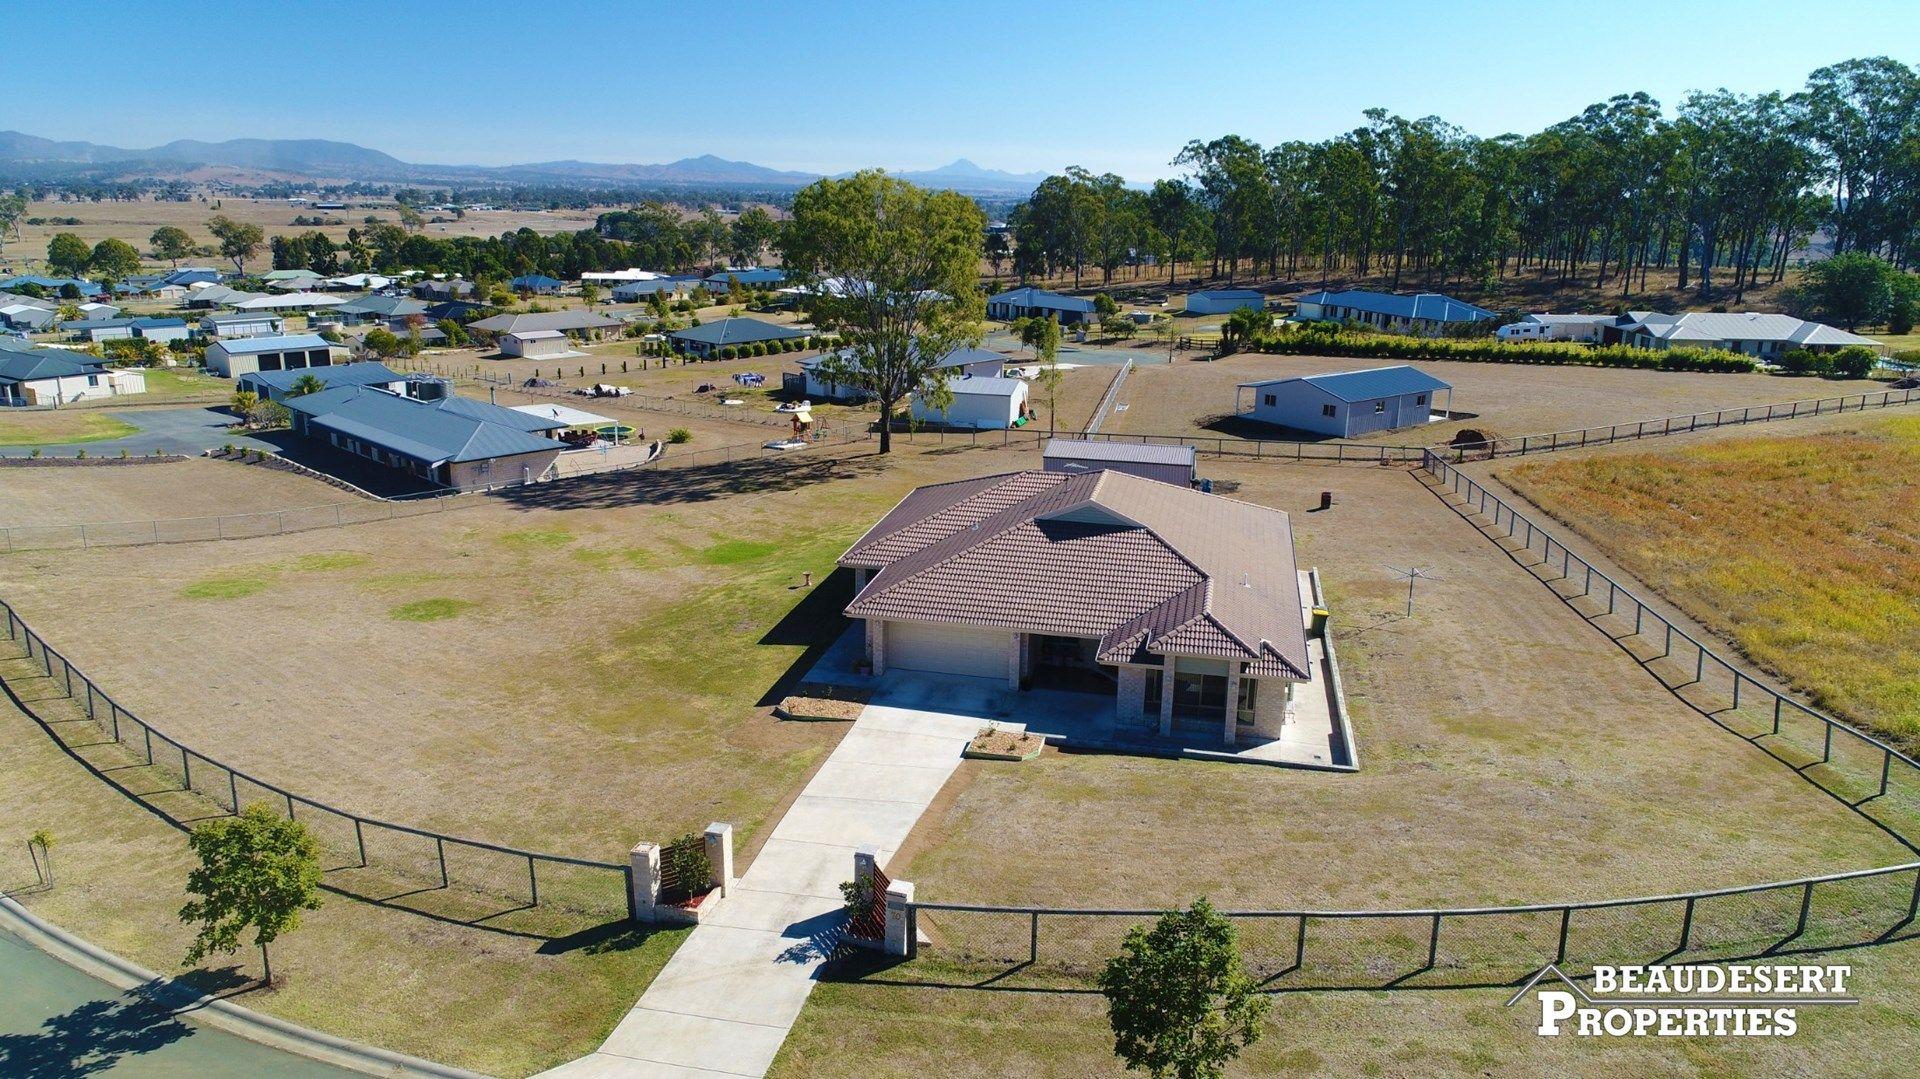 70-74 Panorama Drive, Beaudesert QLD 4285, Image 1